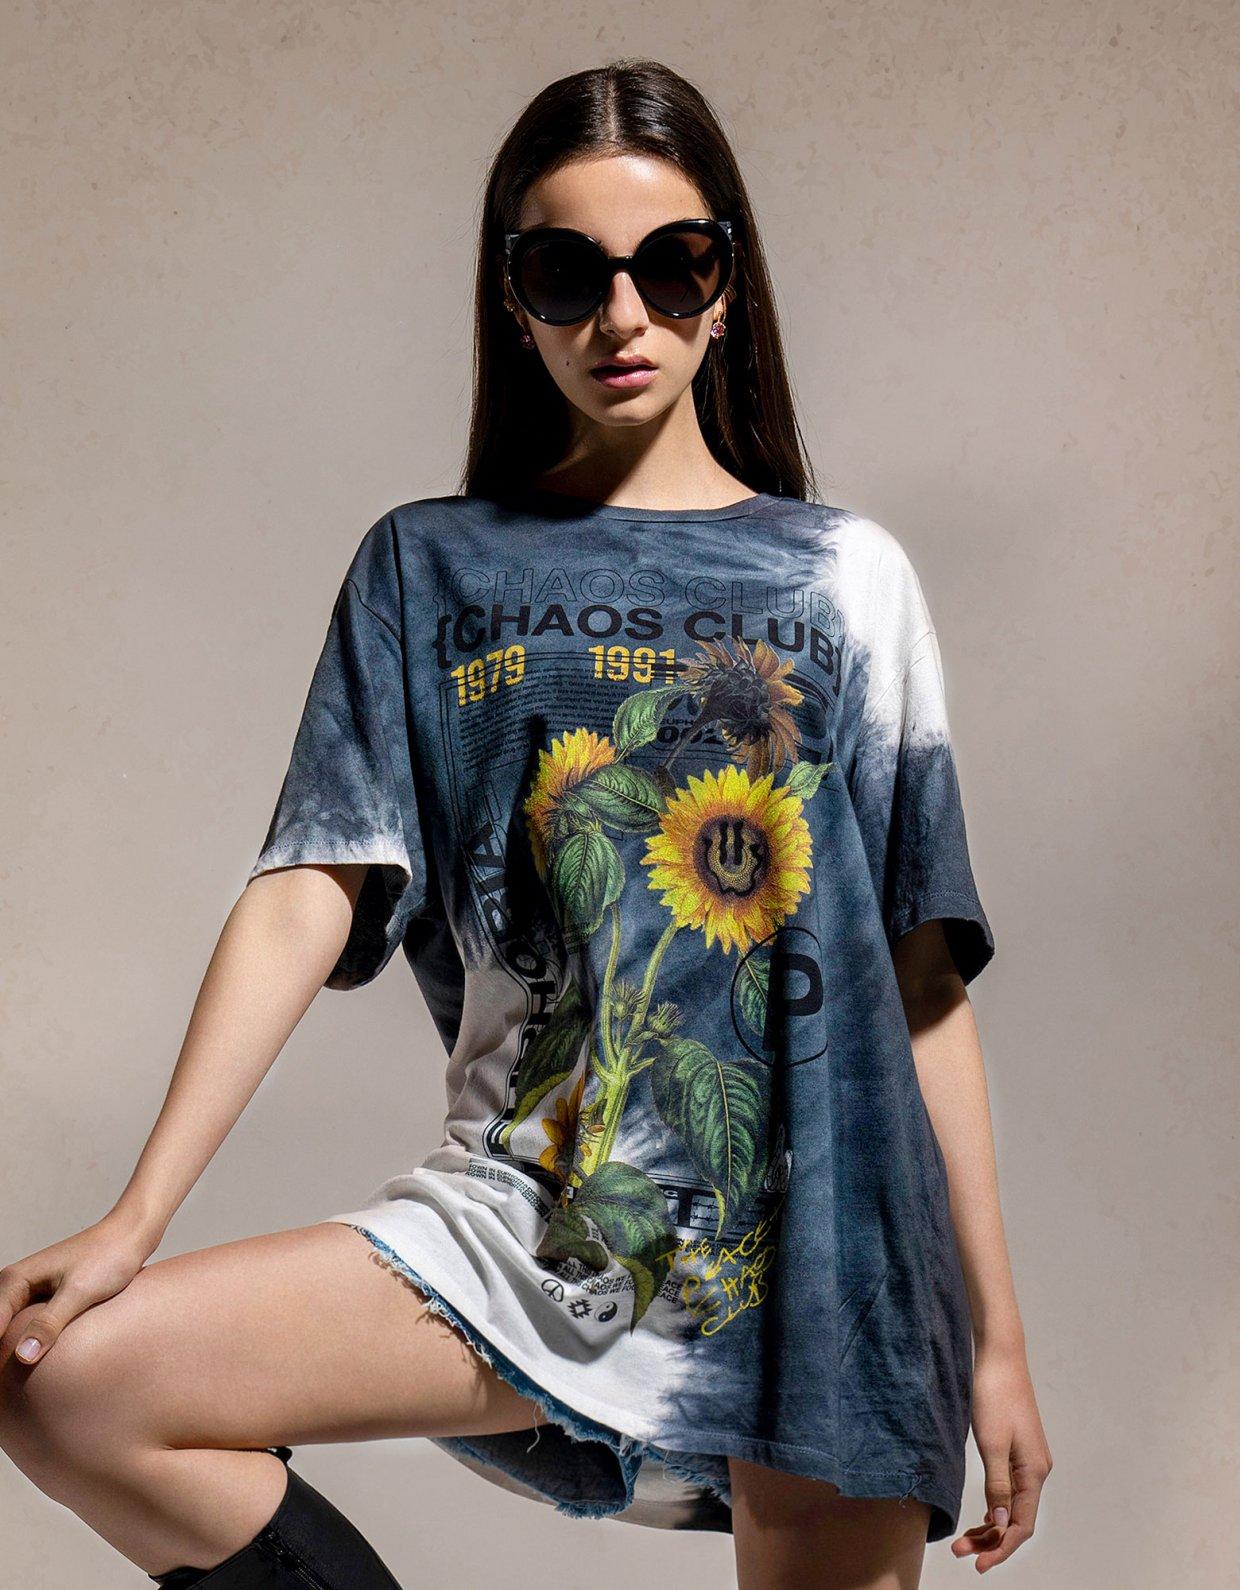 Peace & Chaos Chaos club tie dye t-shirt